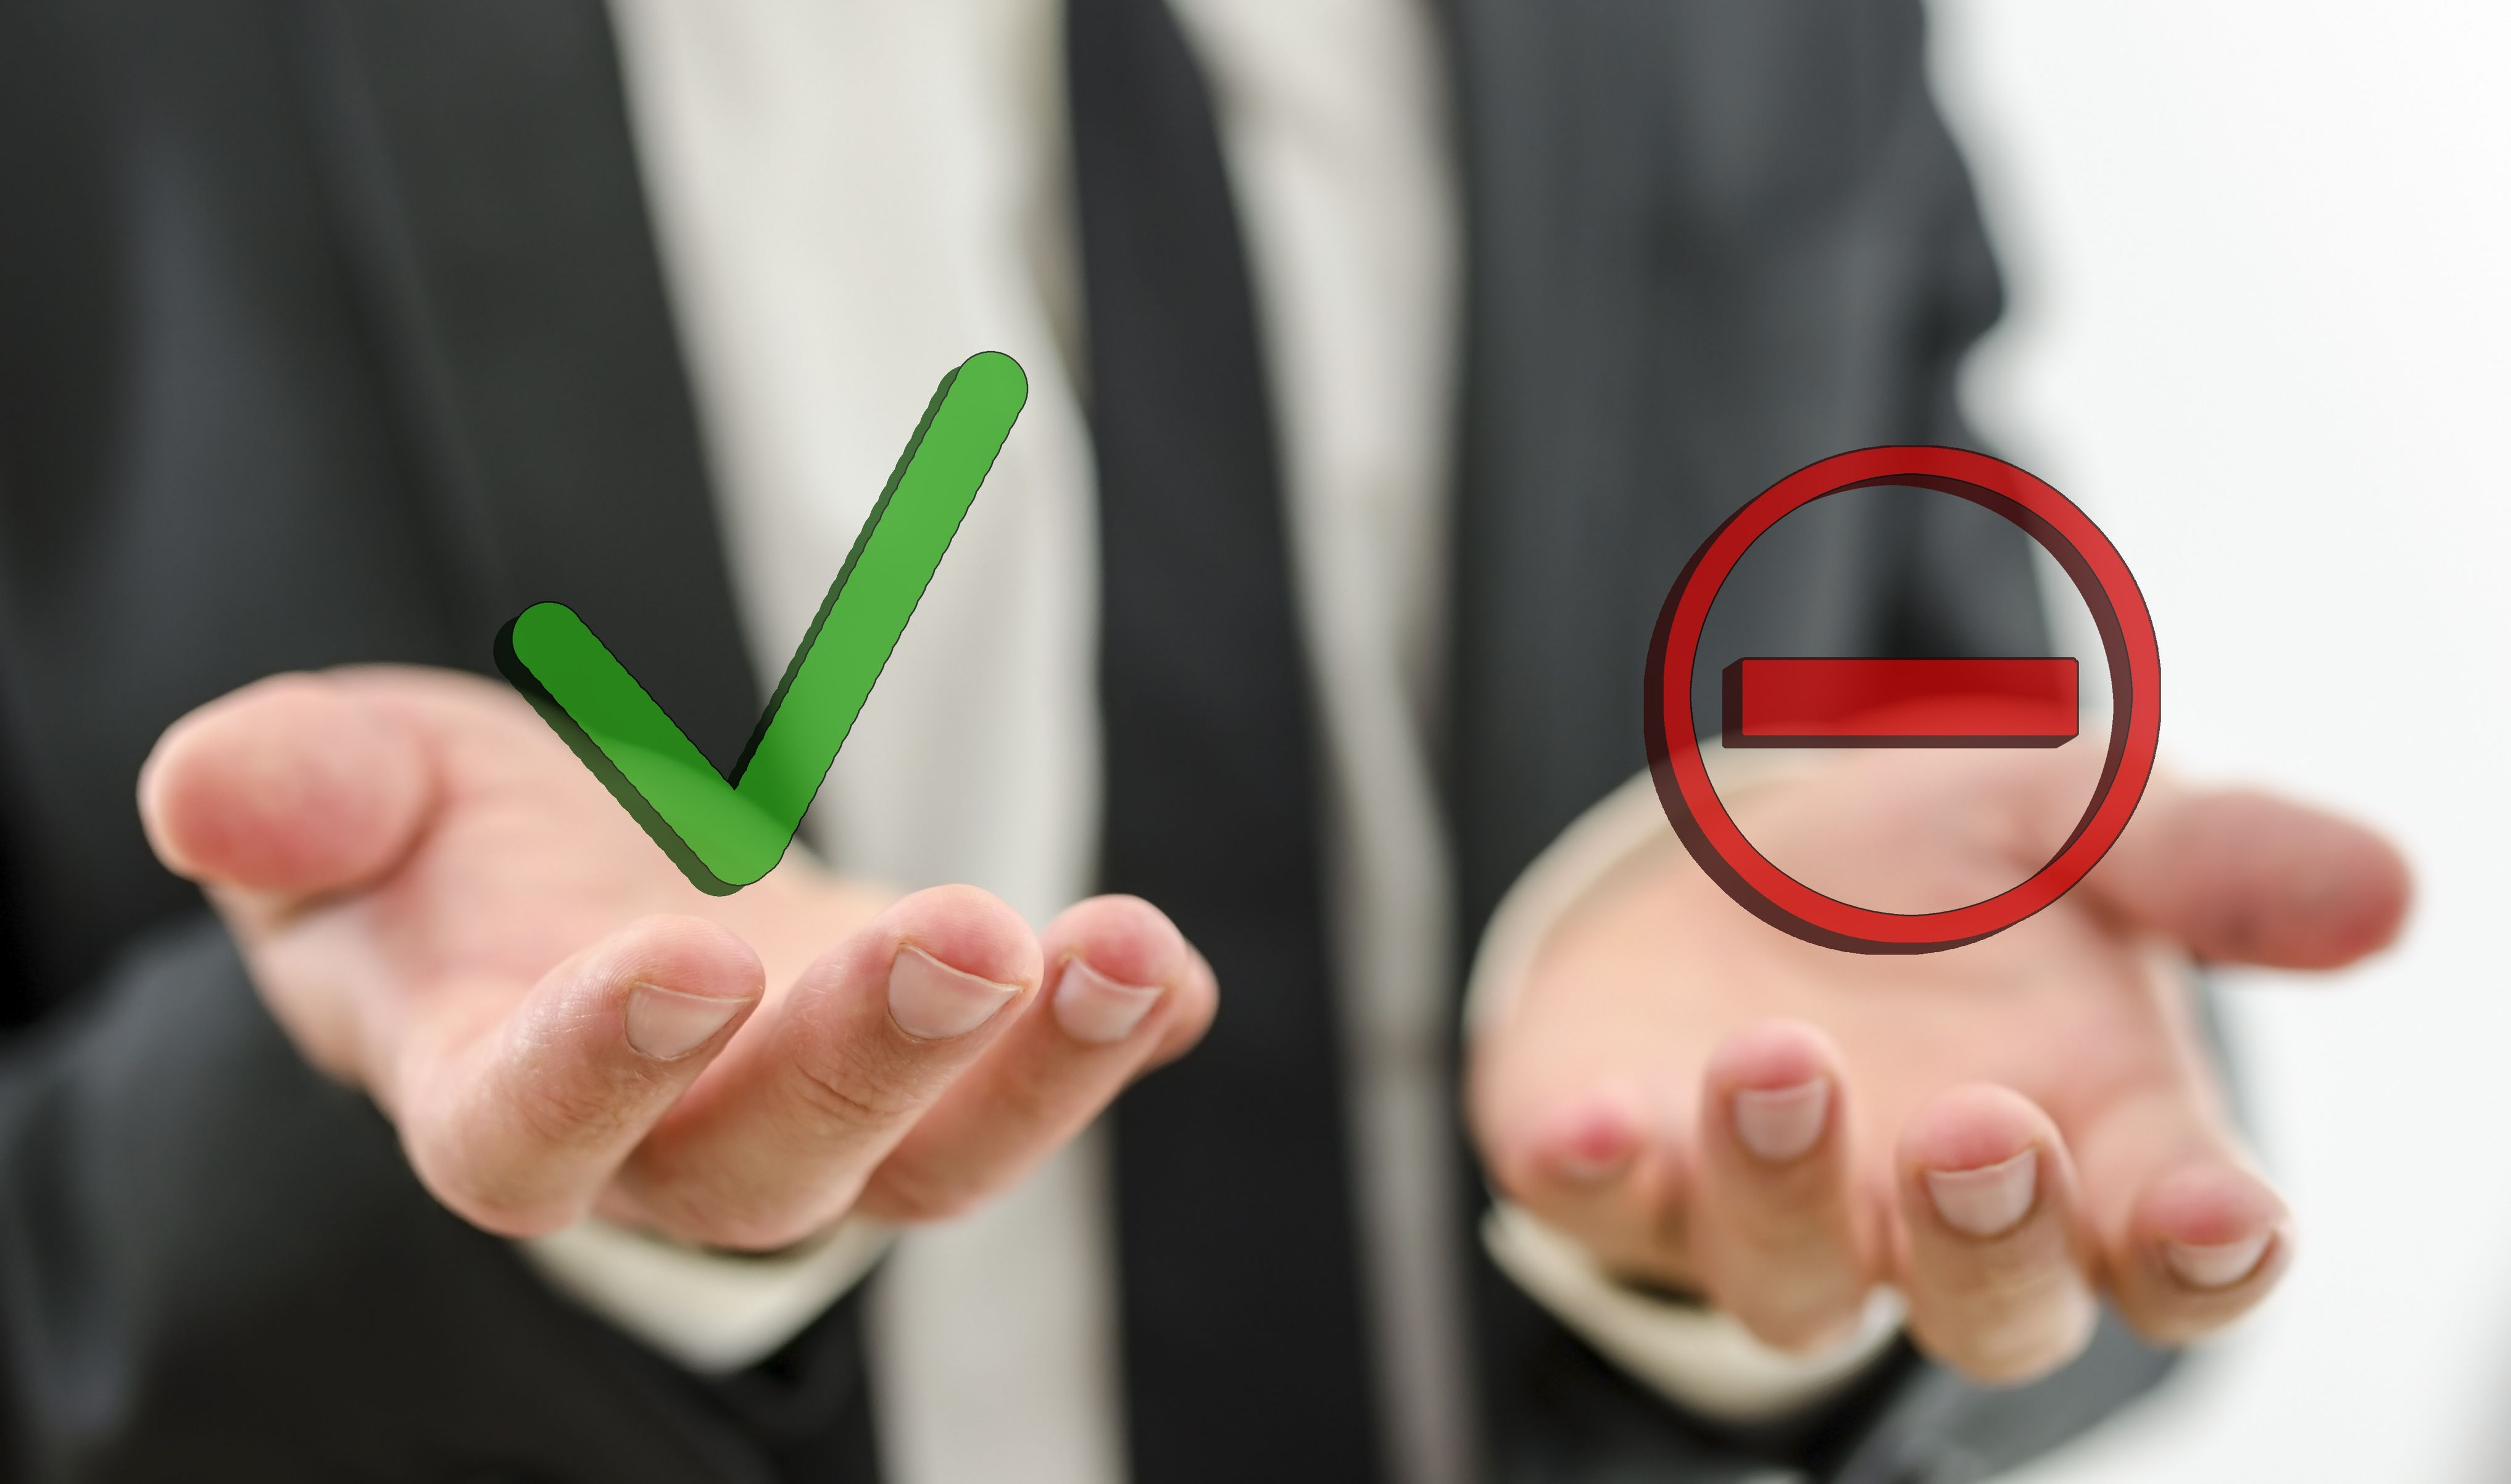 Entscheidungen abwägen - Klinische Forschung Novartis